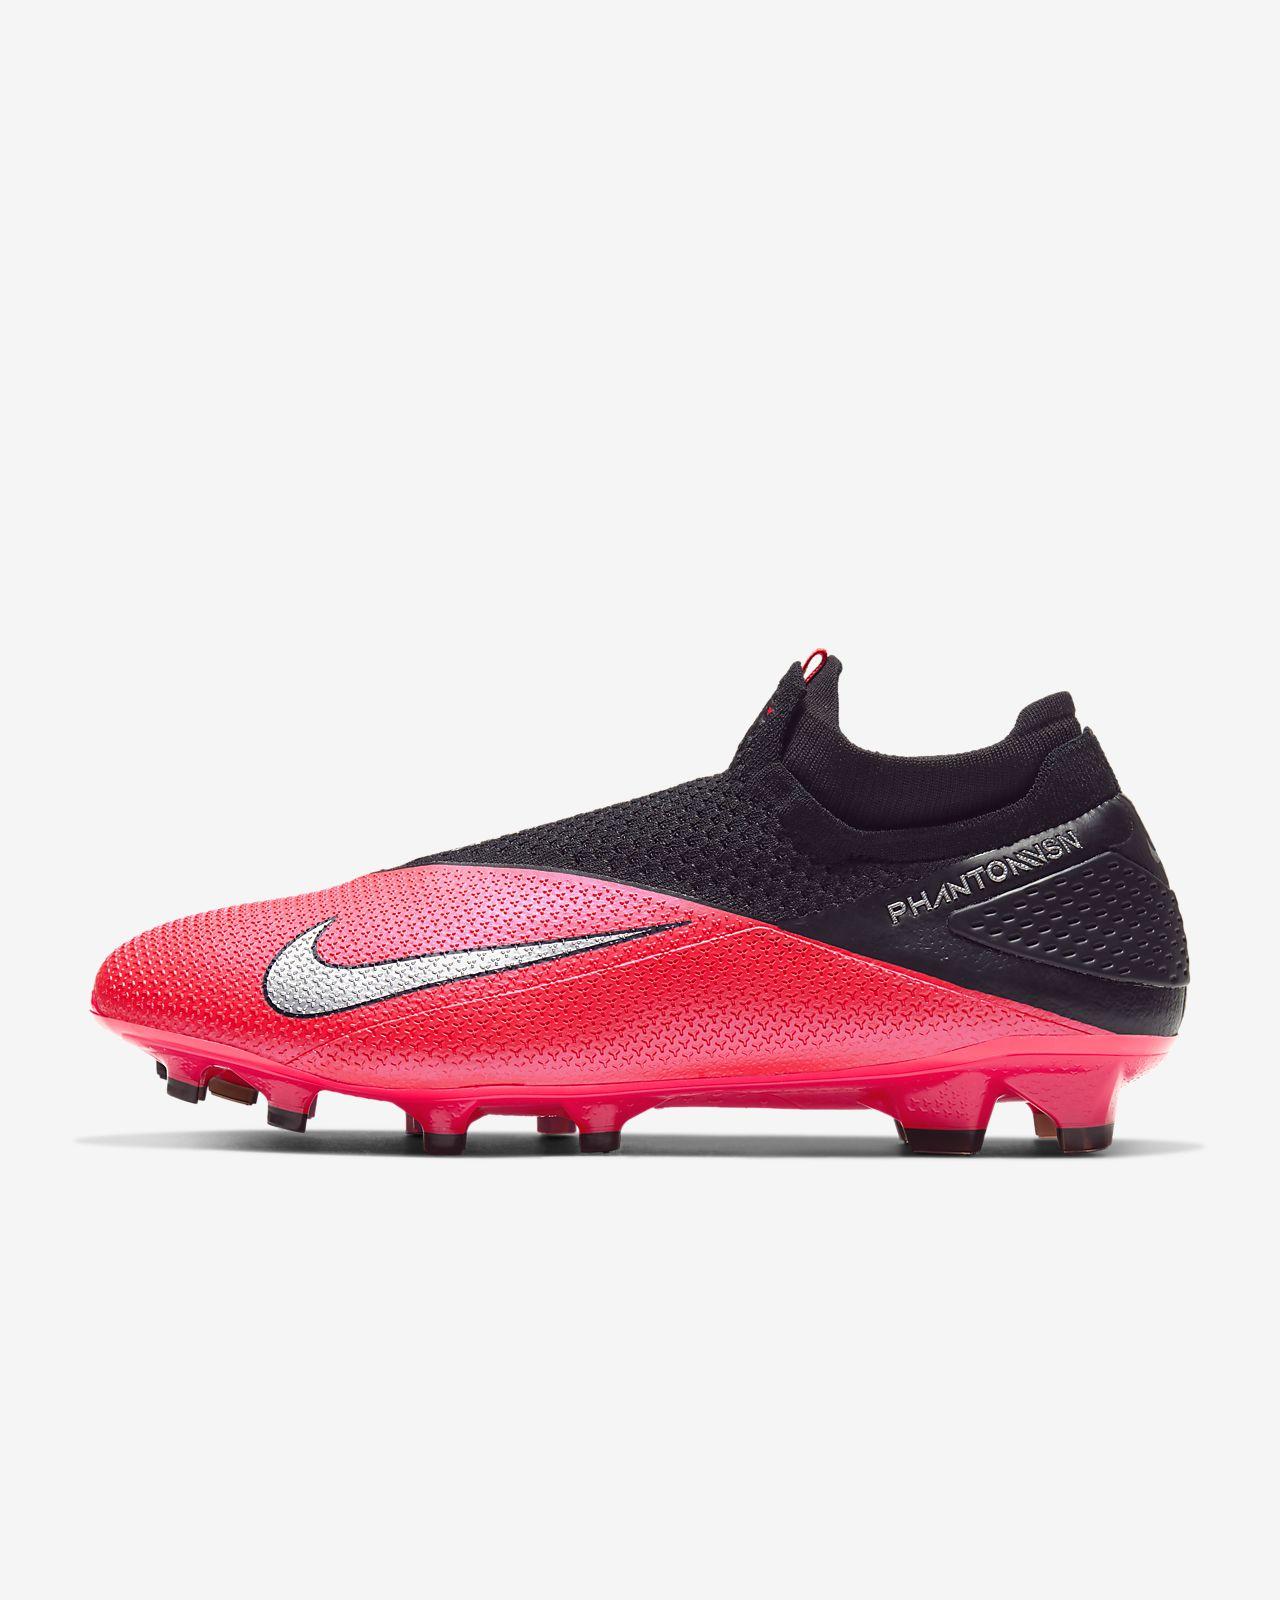 Scarpa da calcio per terreni duri Nike Phantom Vision 2 Pro Dynamic Fit FG